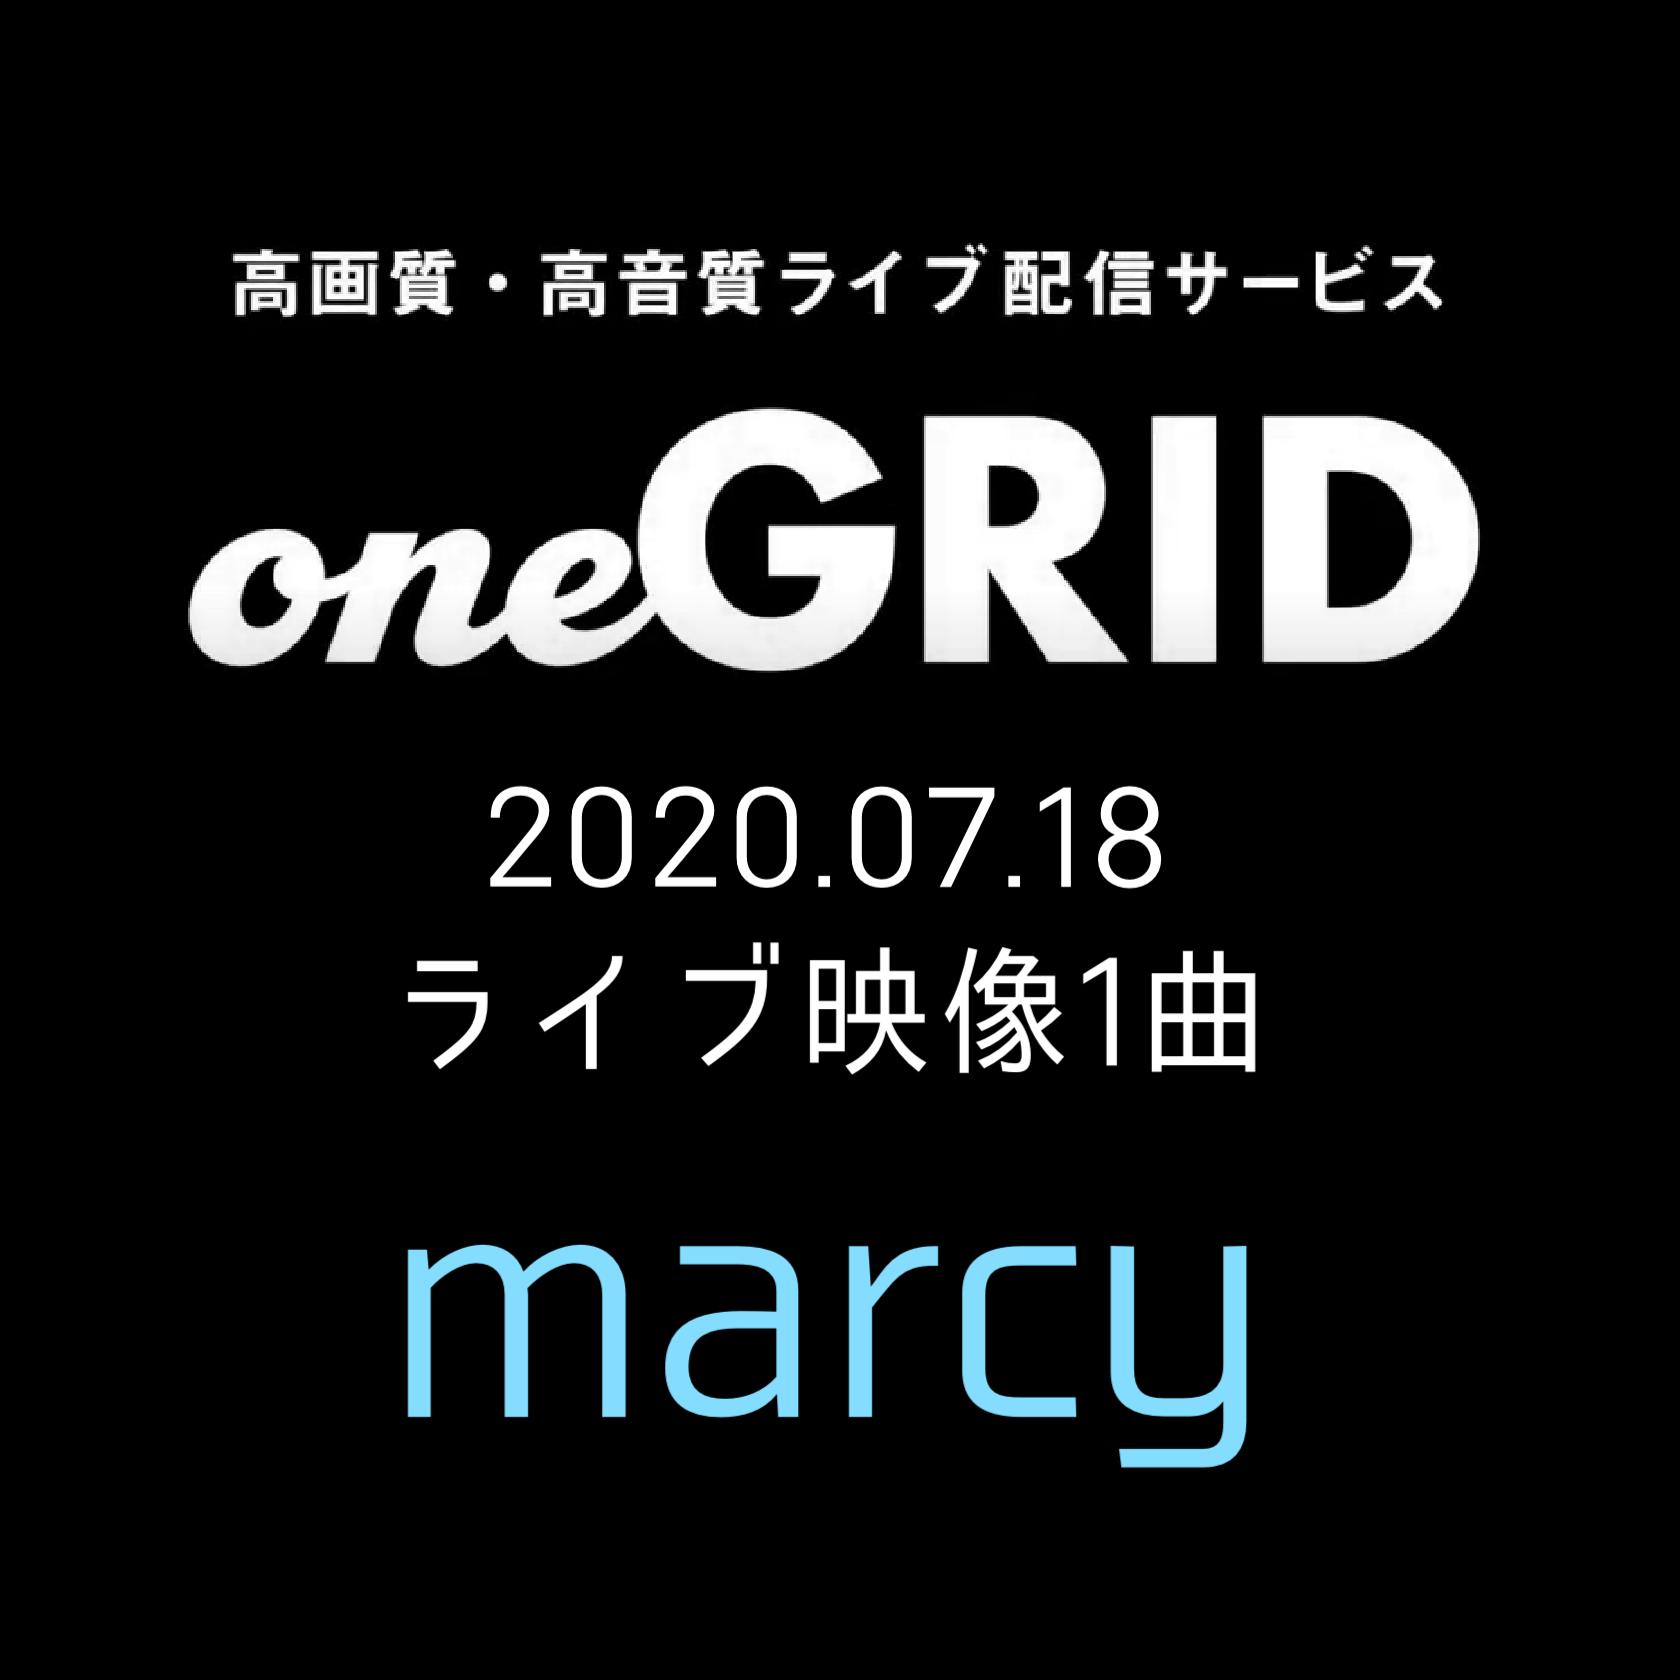 7/18marcyライブ映像